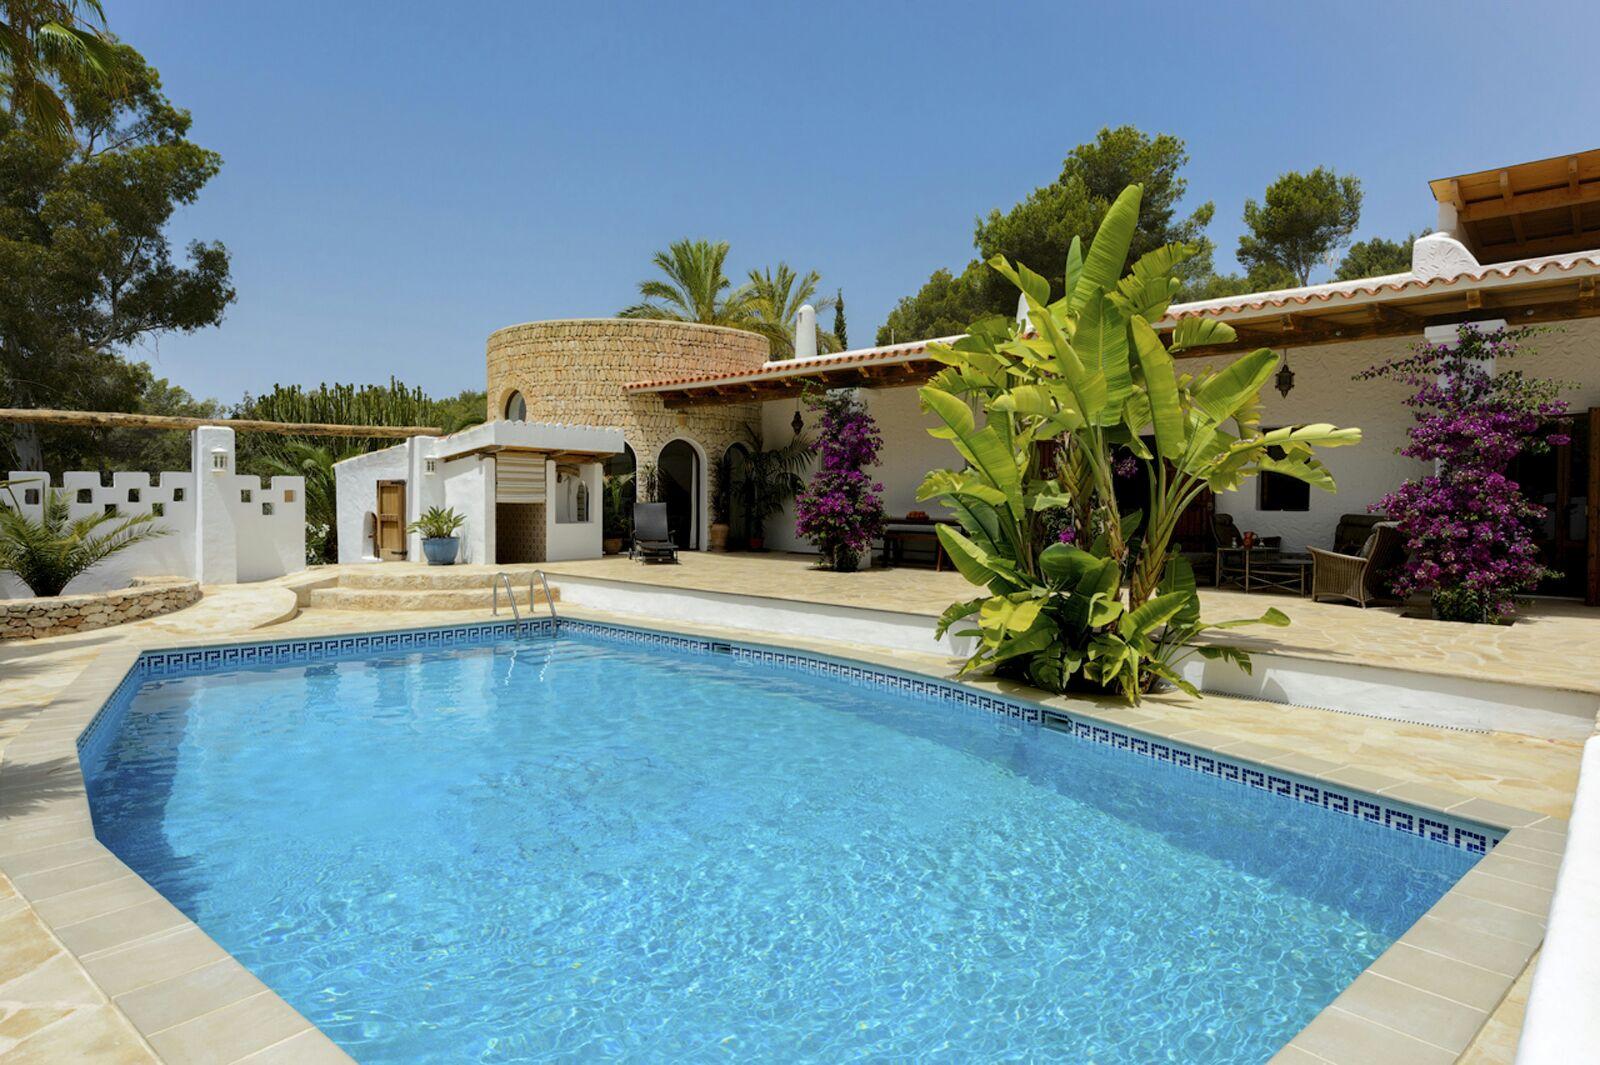 All Year Villa Des Palms